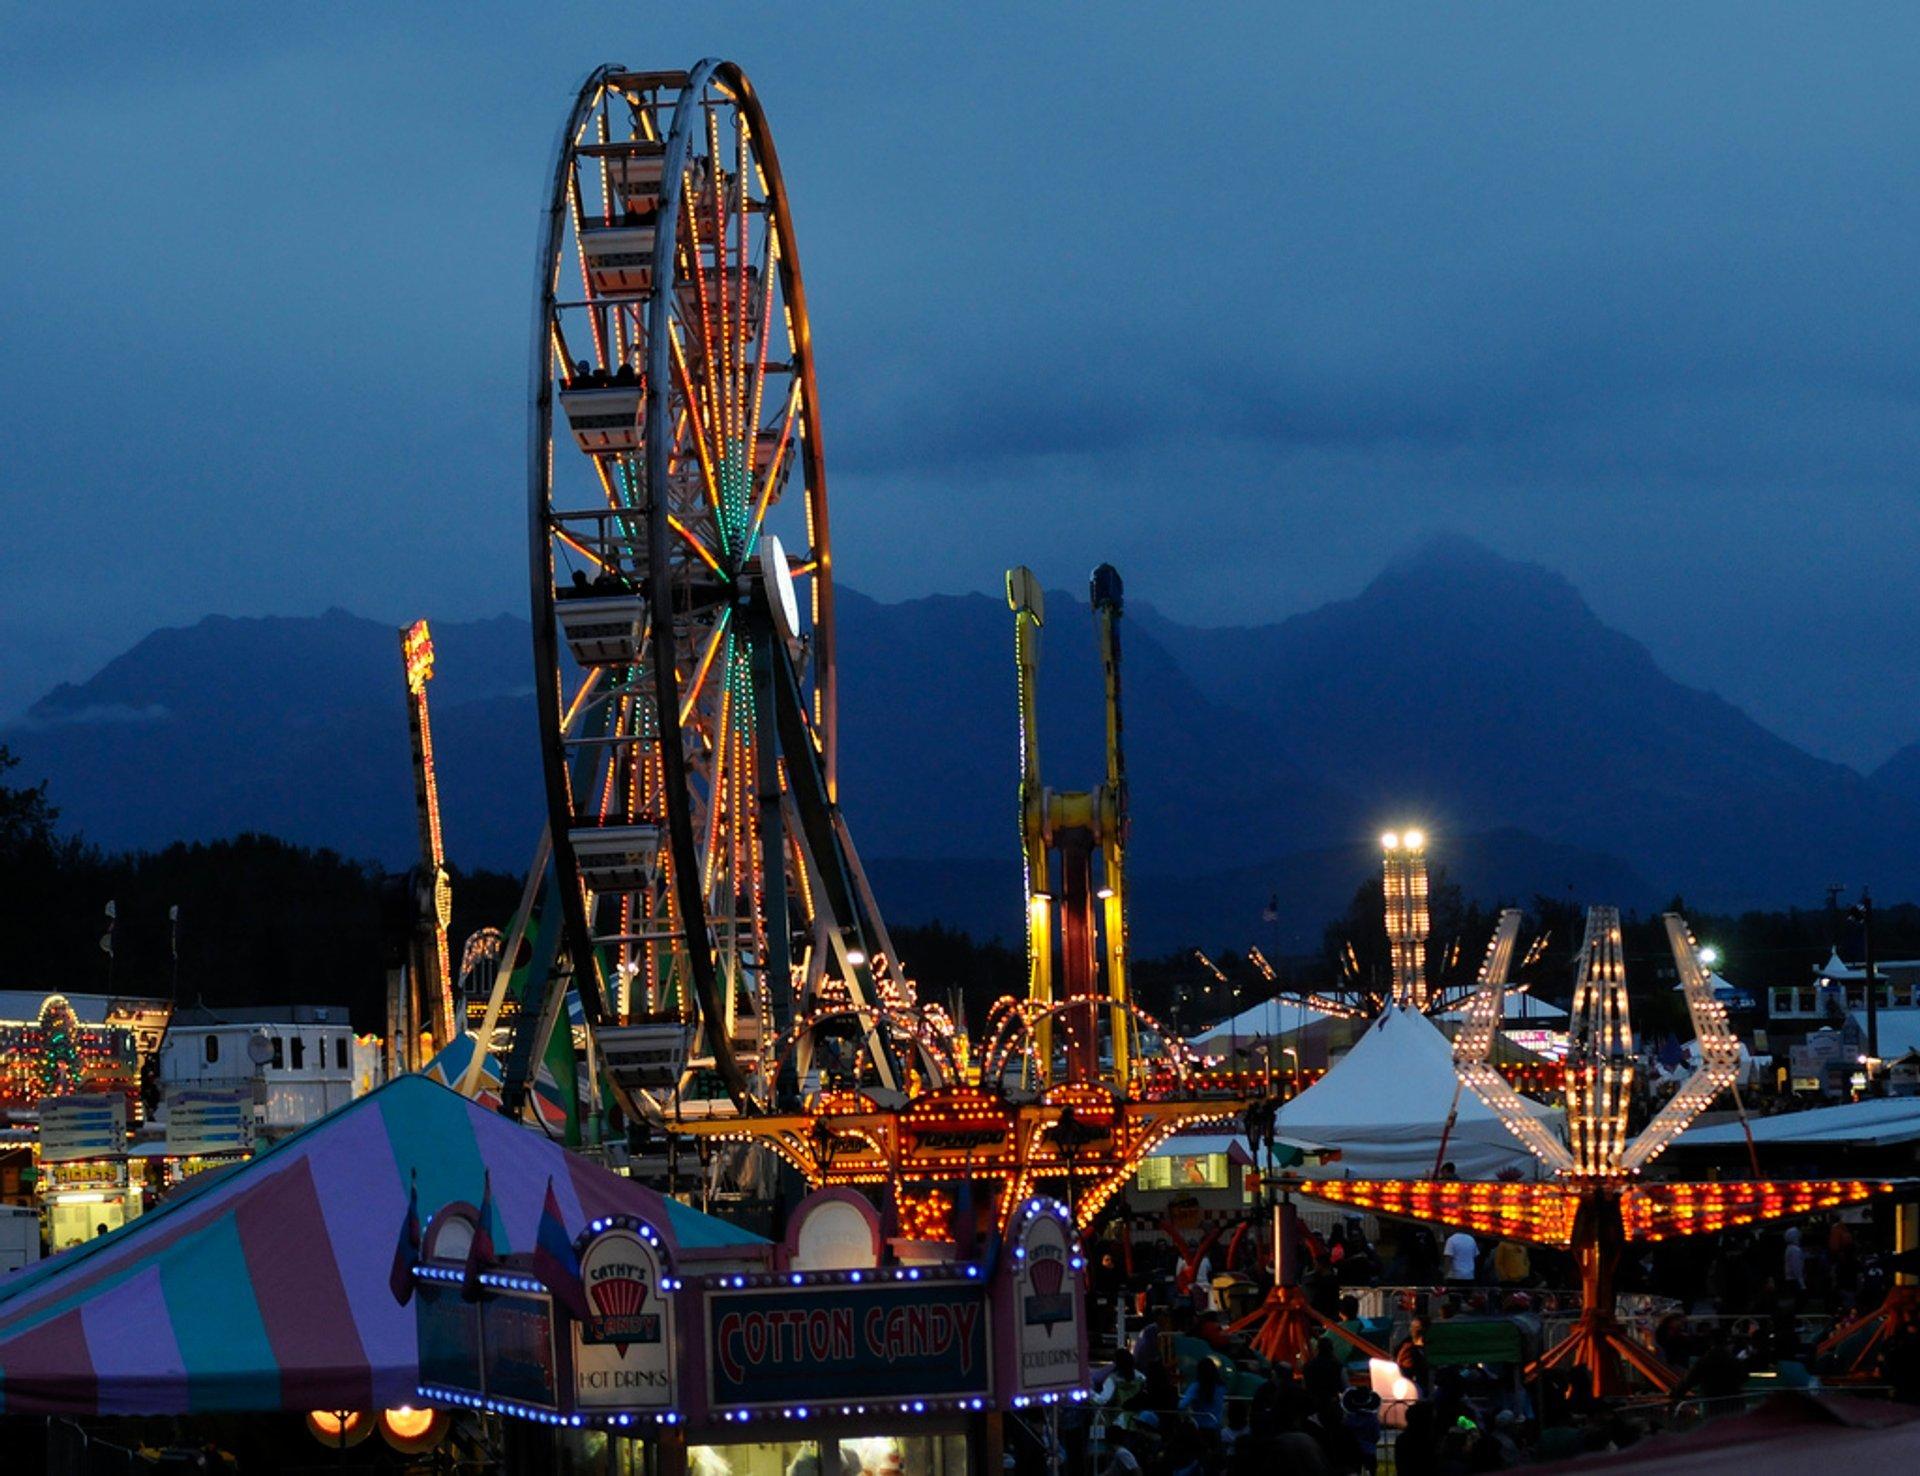 Alaska State Fair in Alaska 2019 - Best Time